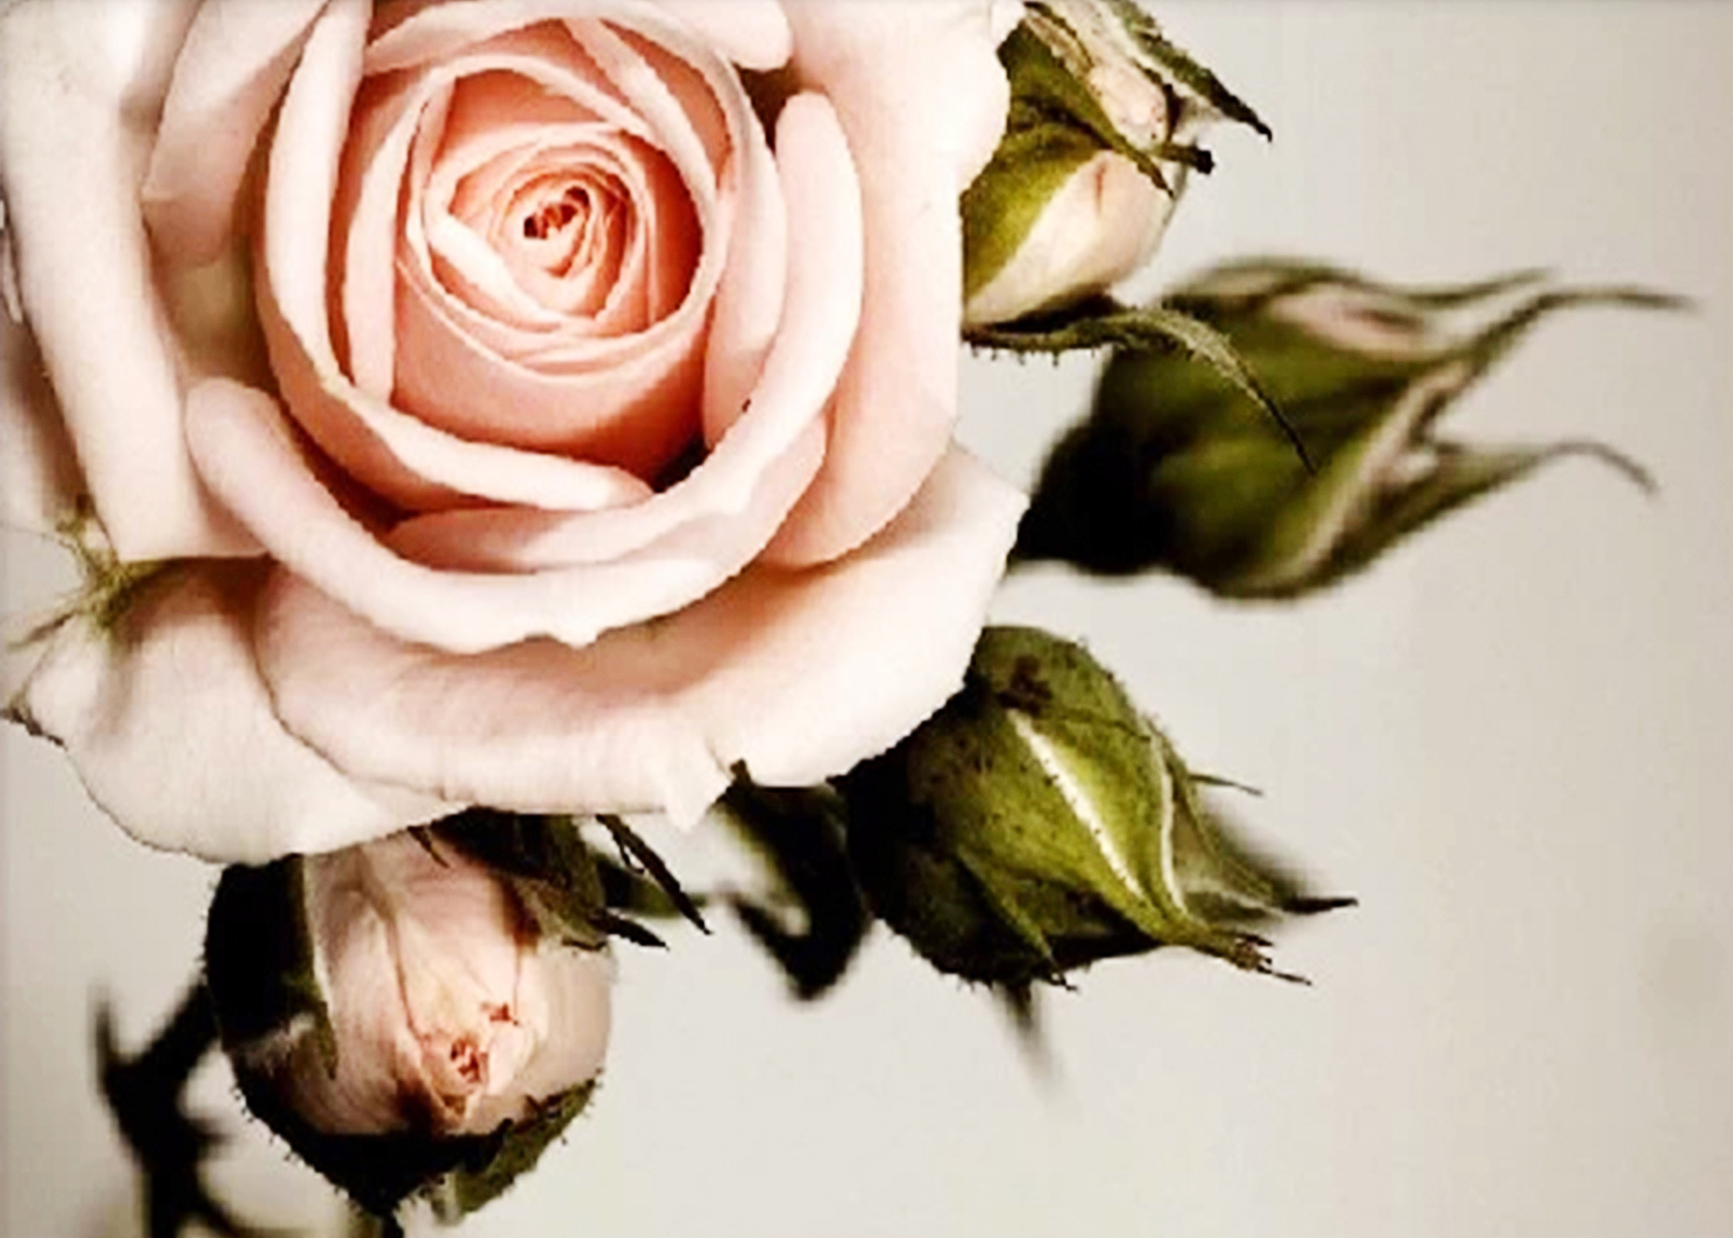 Diamond Вышивка 5D DIY алмазов картина розовый розами Вышивка с кристаллами Rhinestone Мозаика